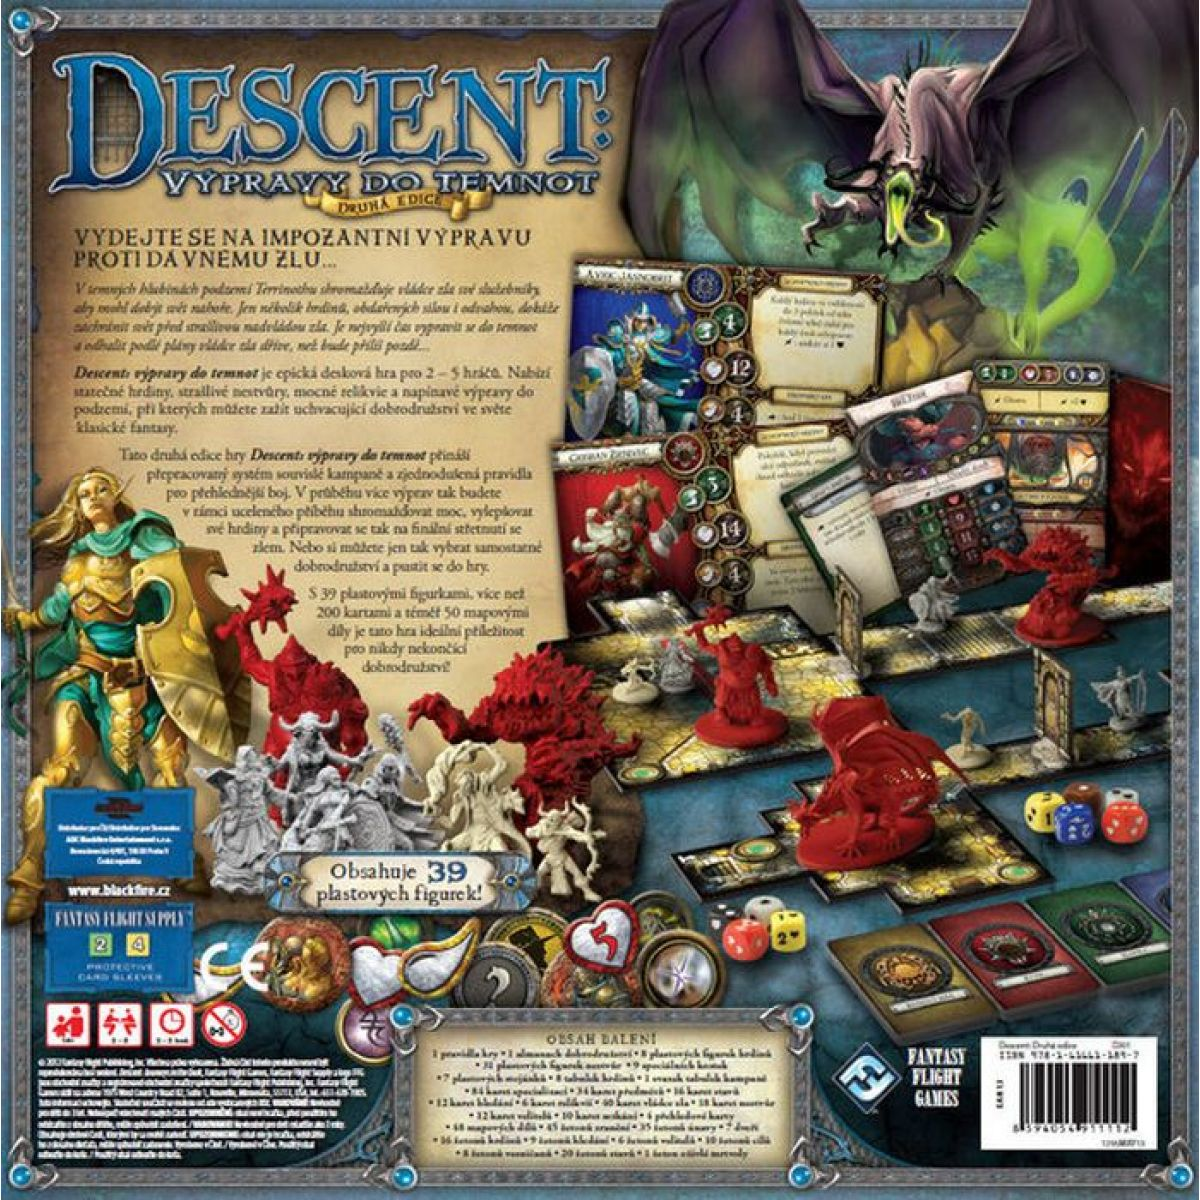 ADC Blackfire Descent Výprava do temnot - druhá edice #2